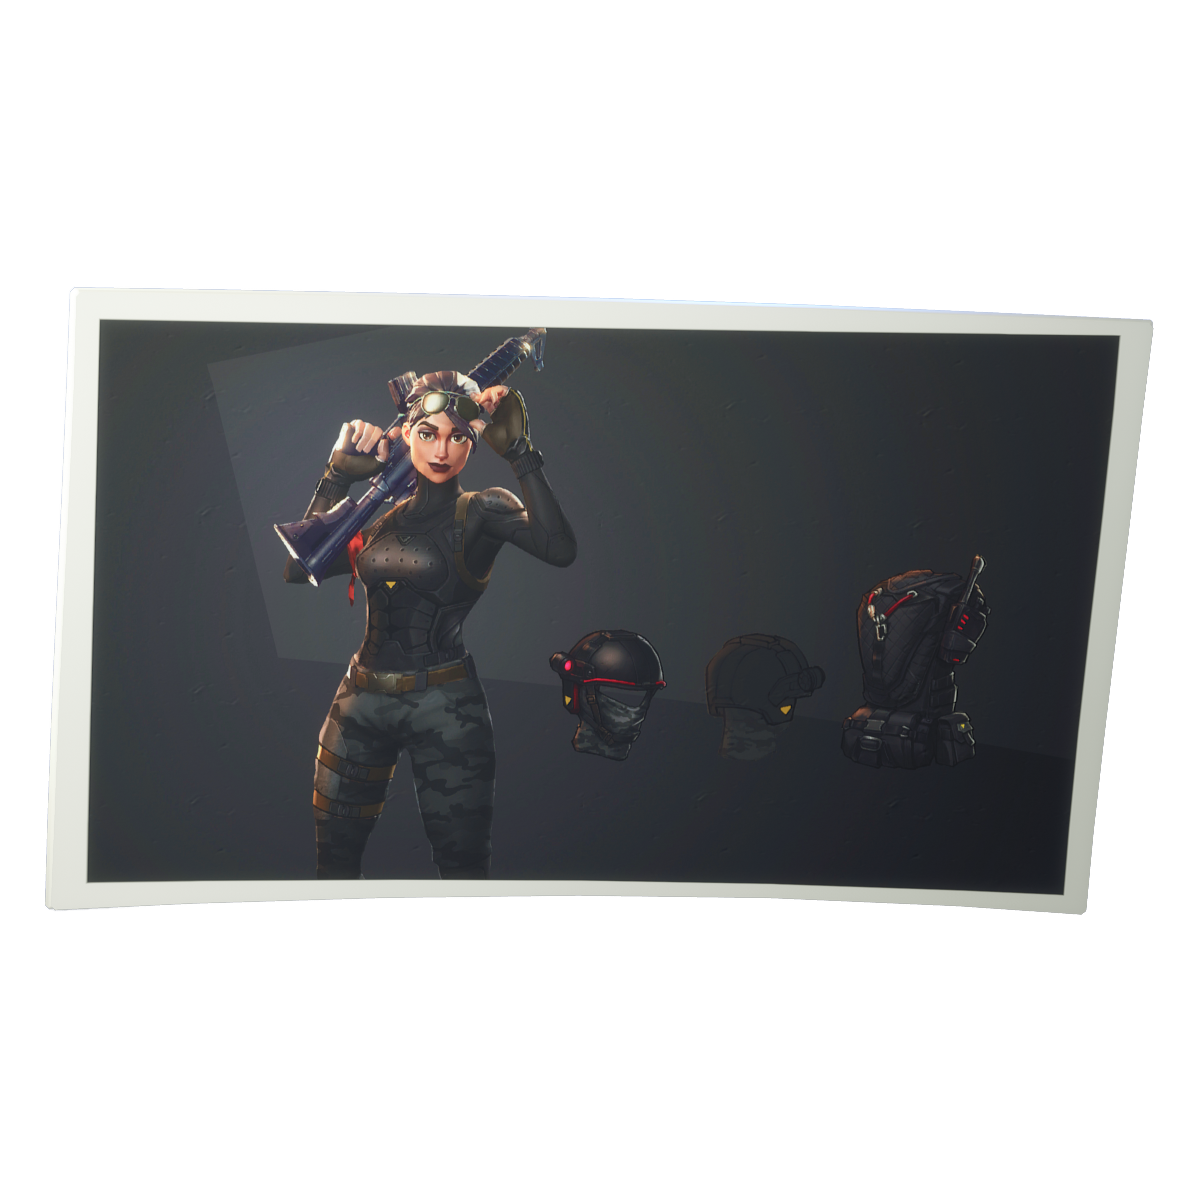 fortnite elite agent - fortnite character png elite agent